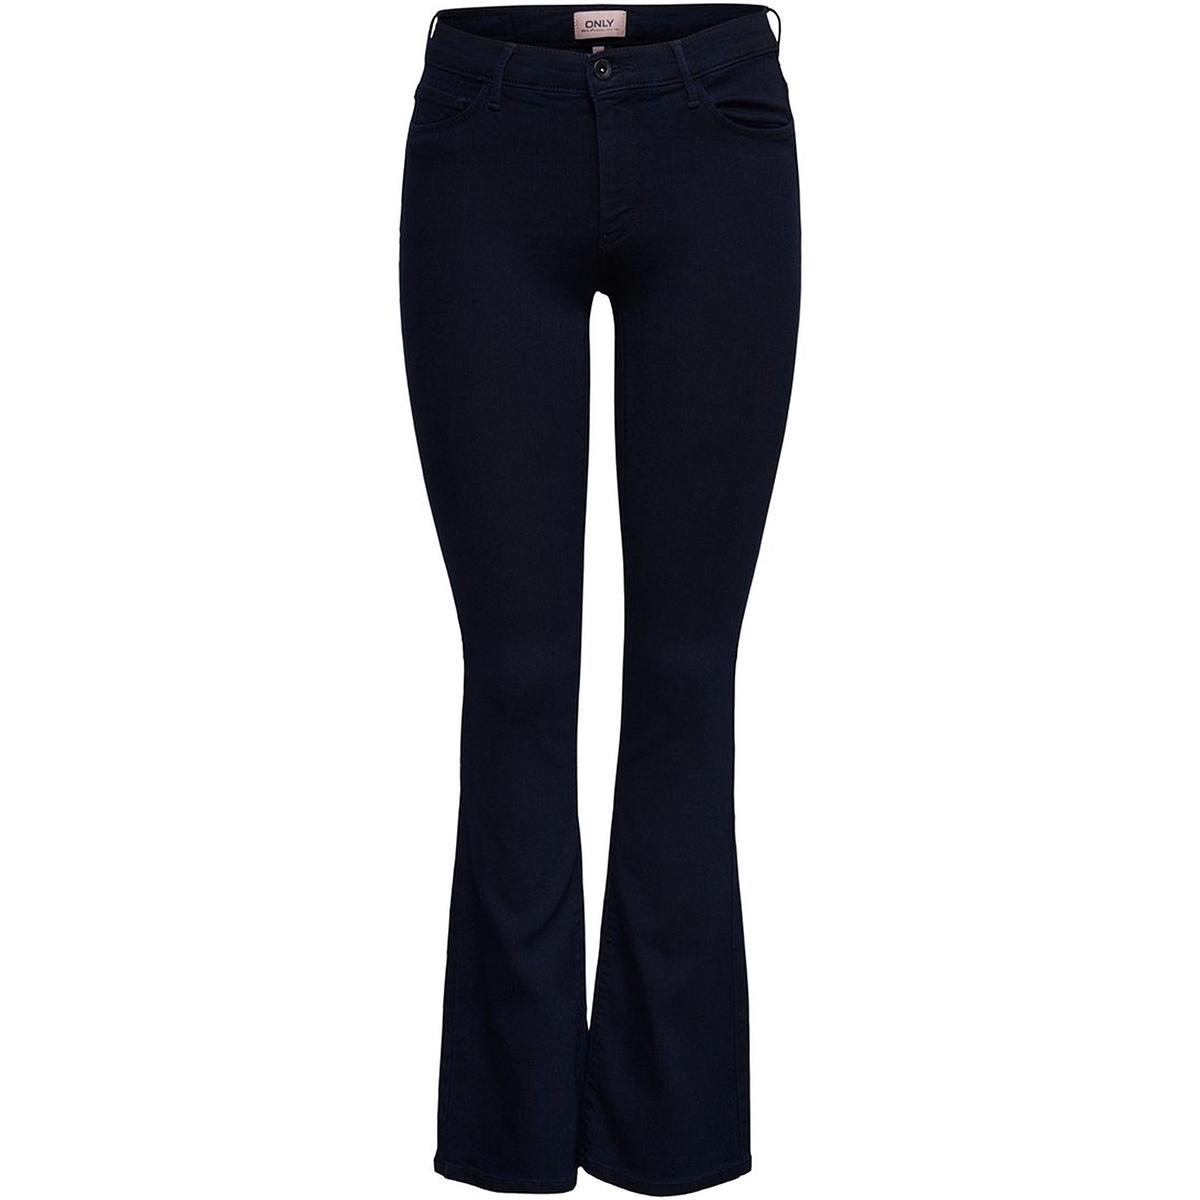 onlhella reg sweet flared dnm jeans 15170480 only jeans dark blue denim